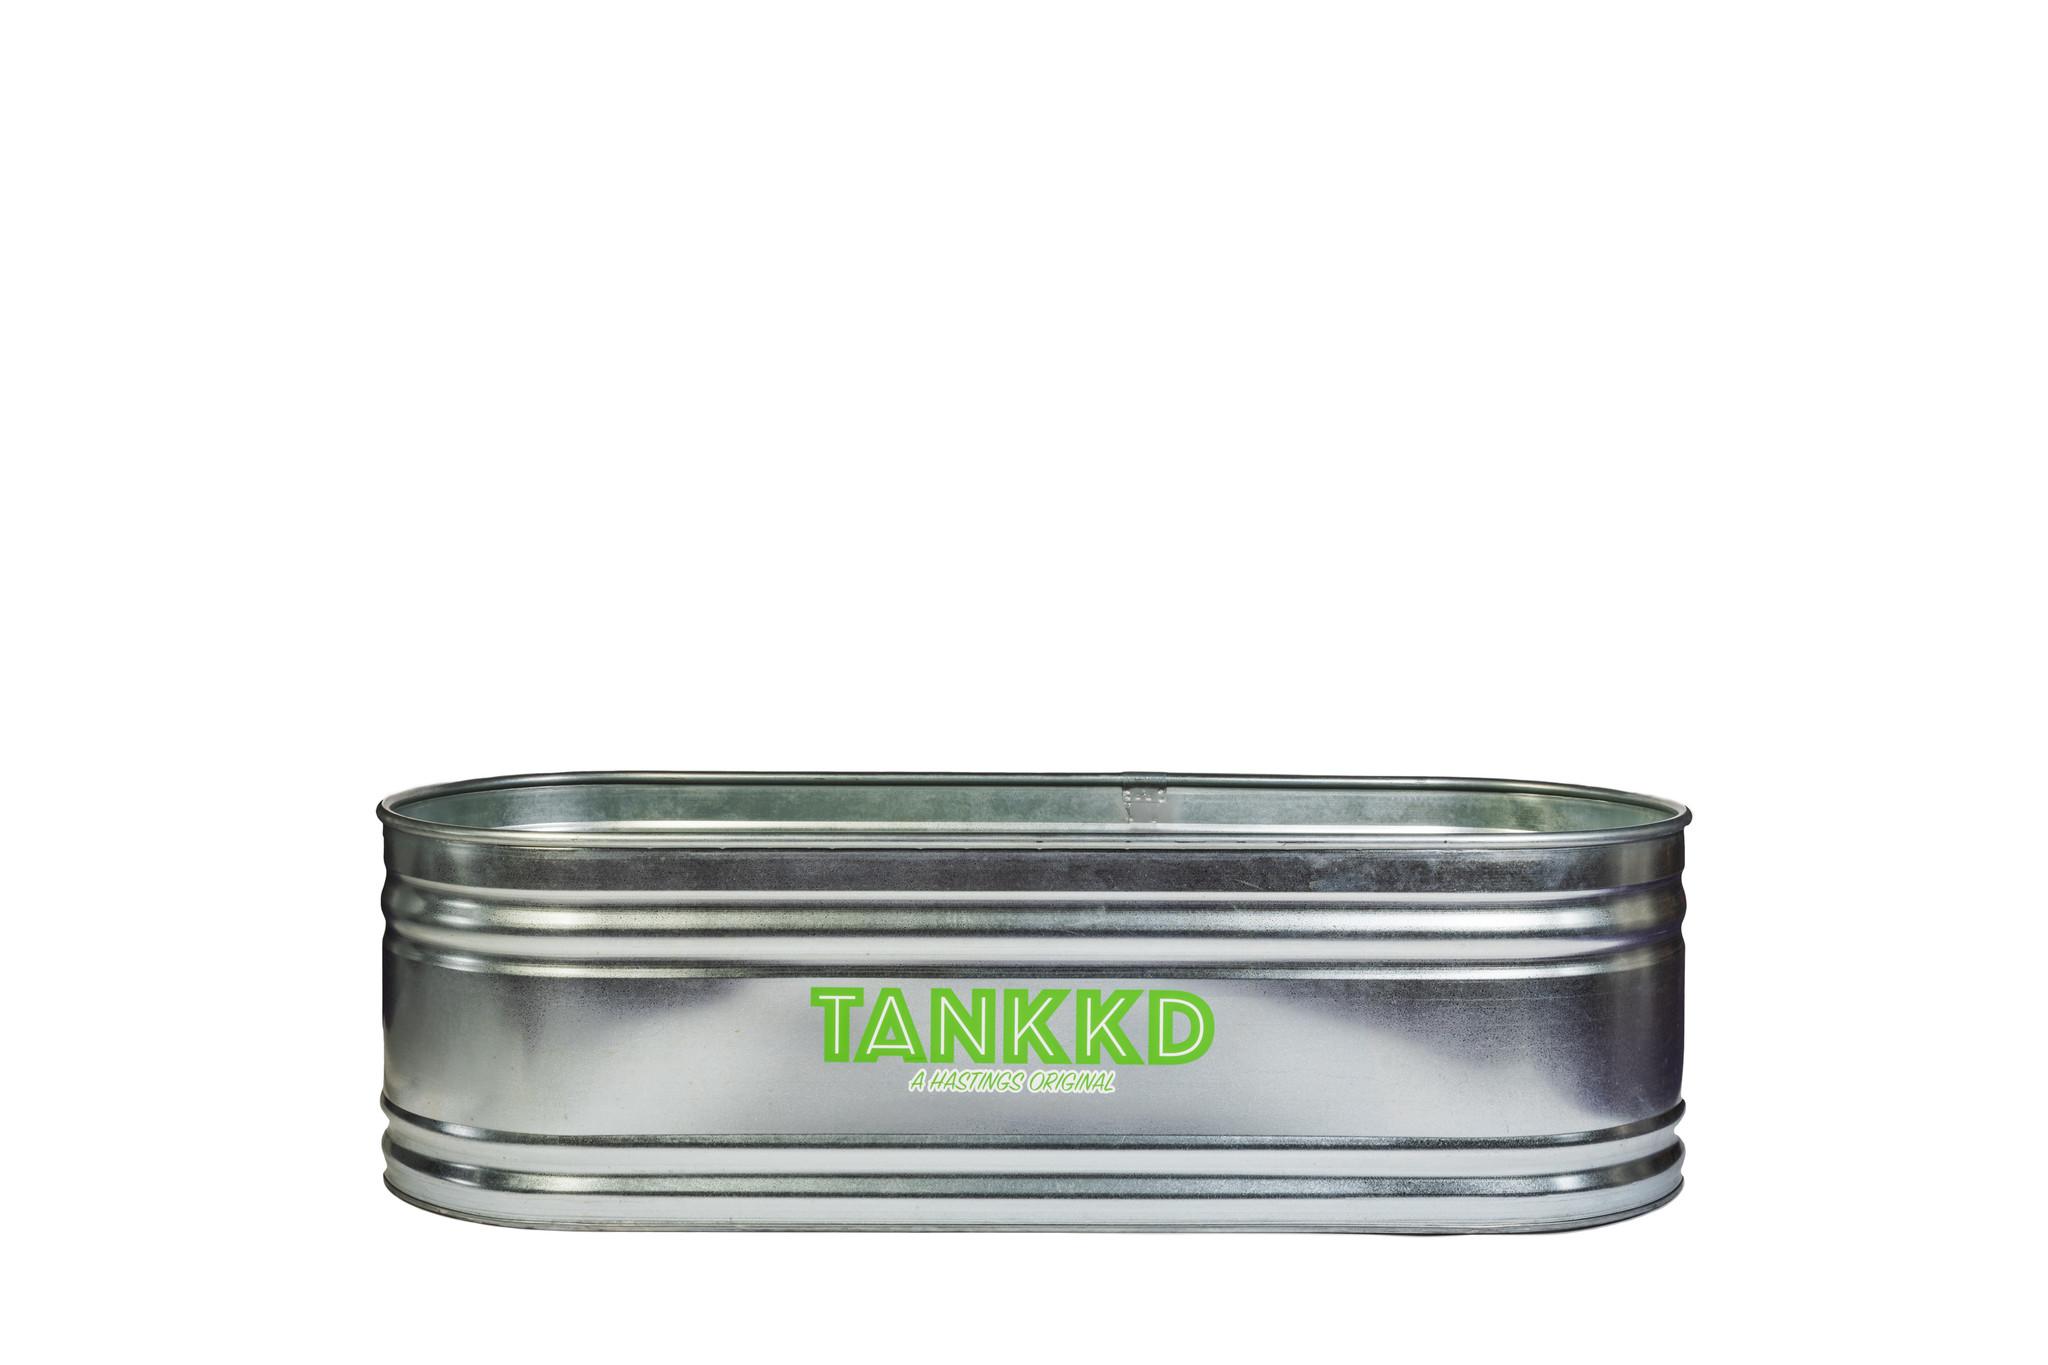 Tankkd a Hastings original ovale stock tank Green Label-9